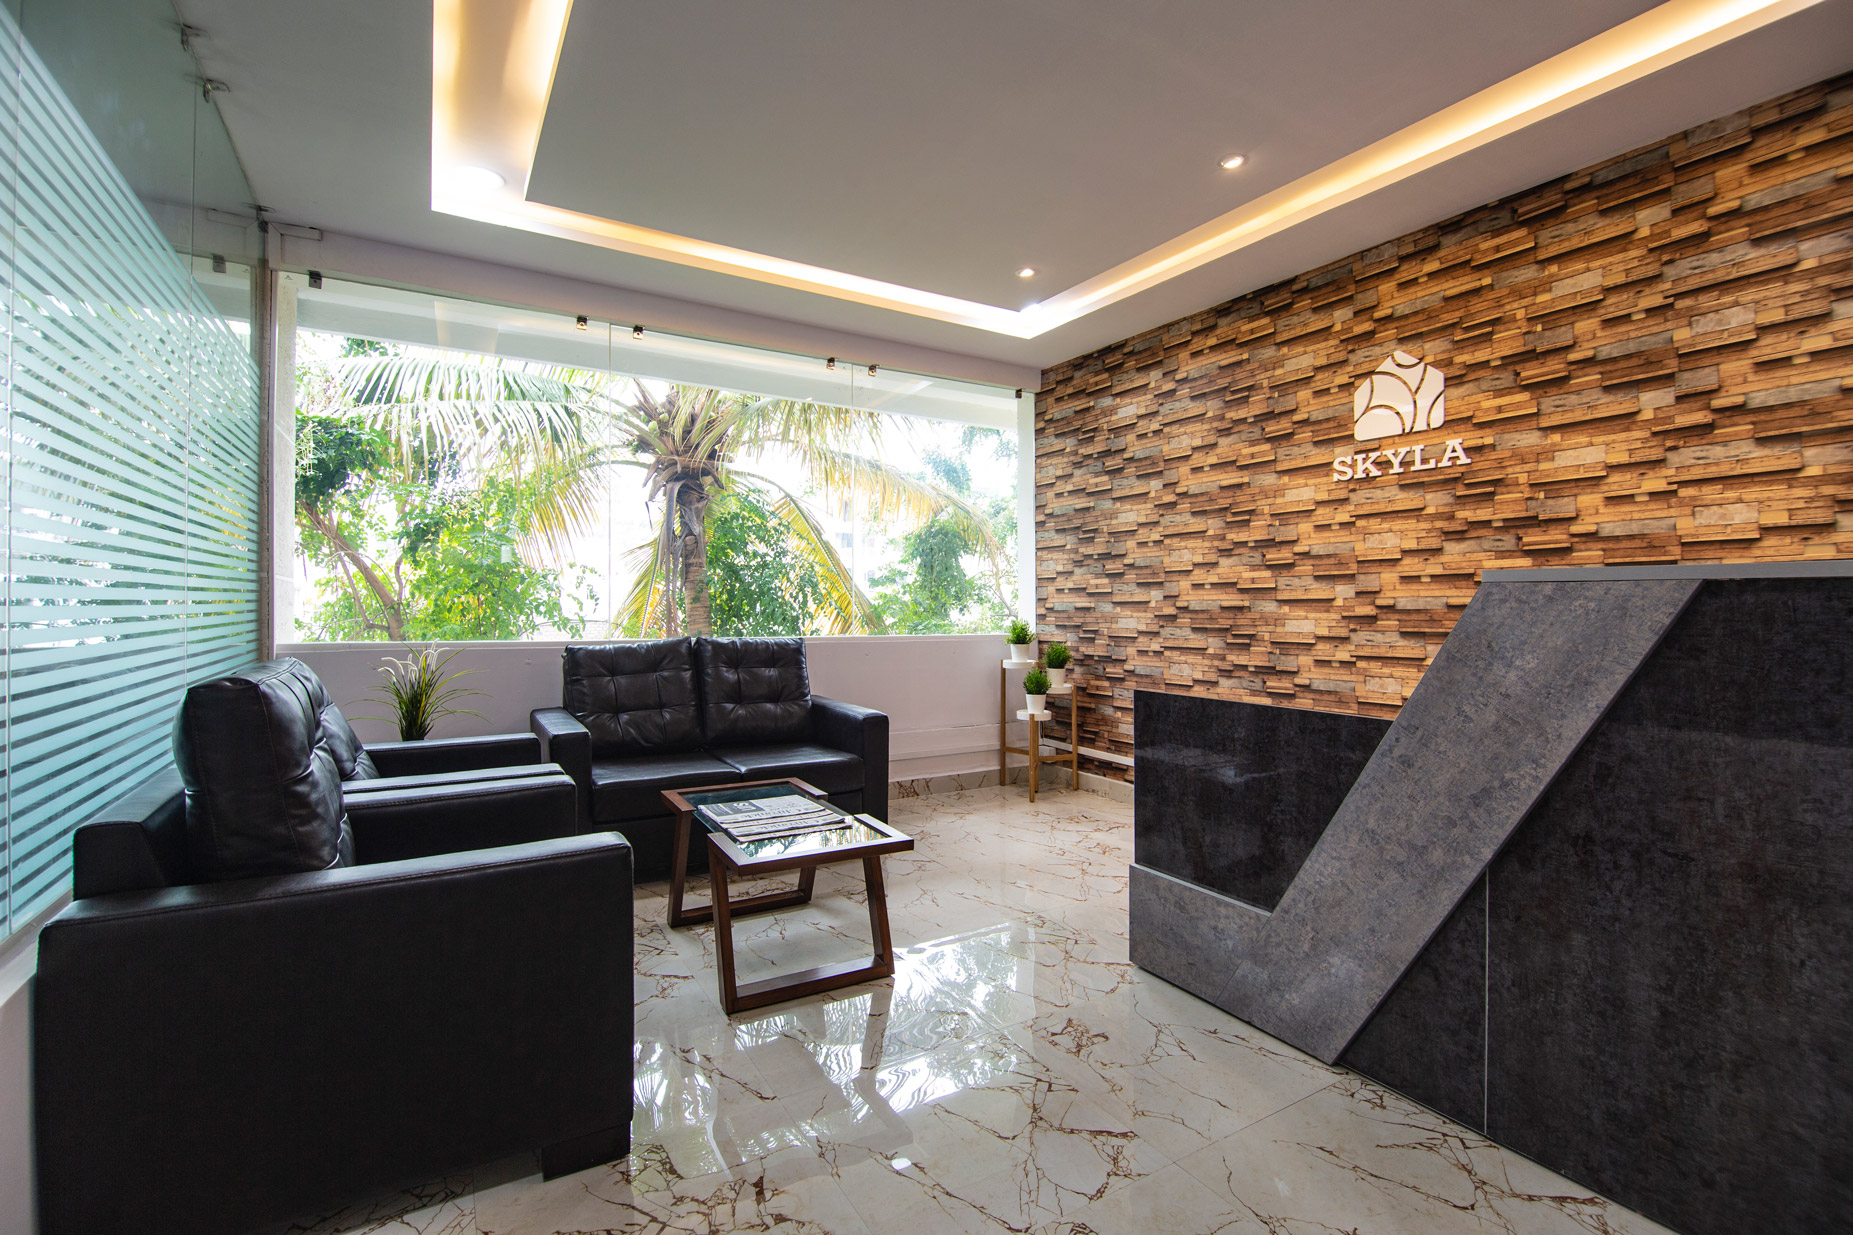 skyla-service-apartment-hyderabad-banjara-hills-bluefox-restaurant-executive8.jpg